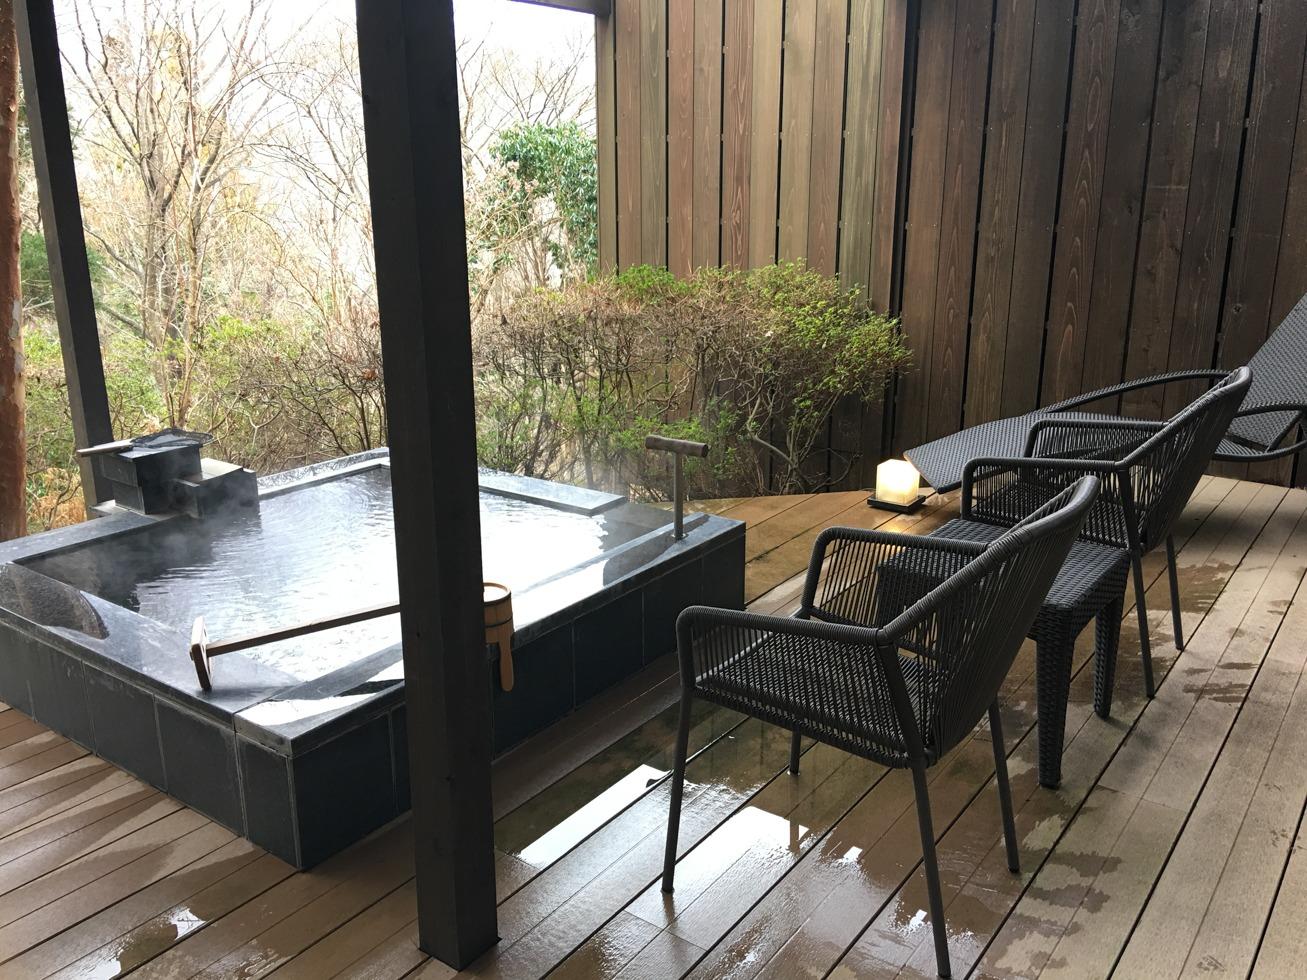 強羅白檀の個室露天風呂の写真